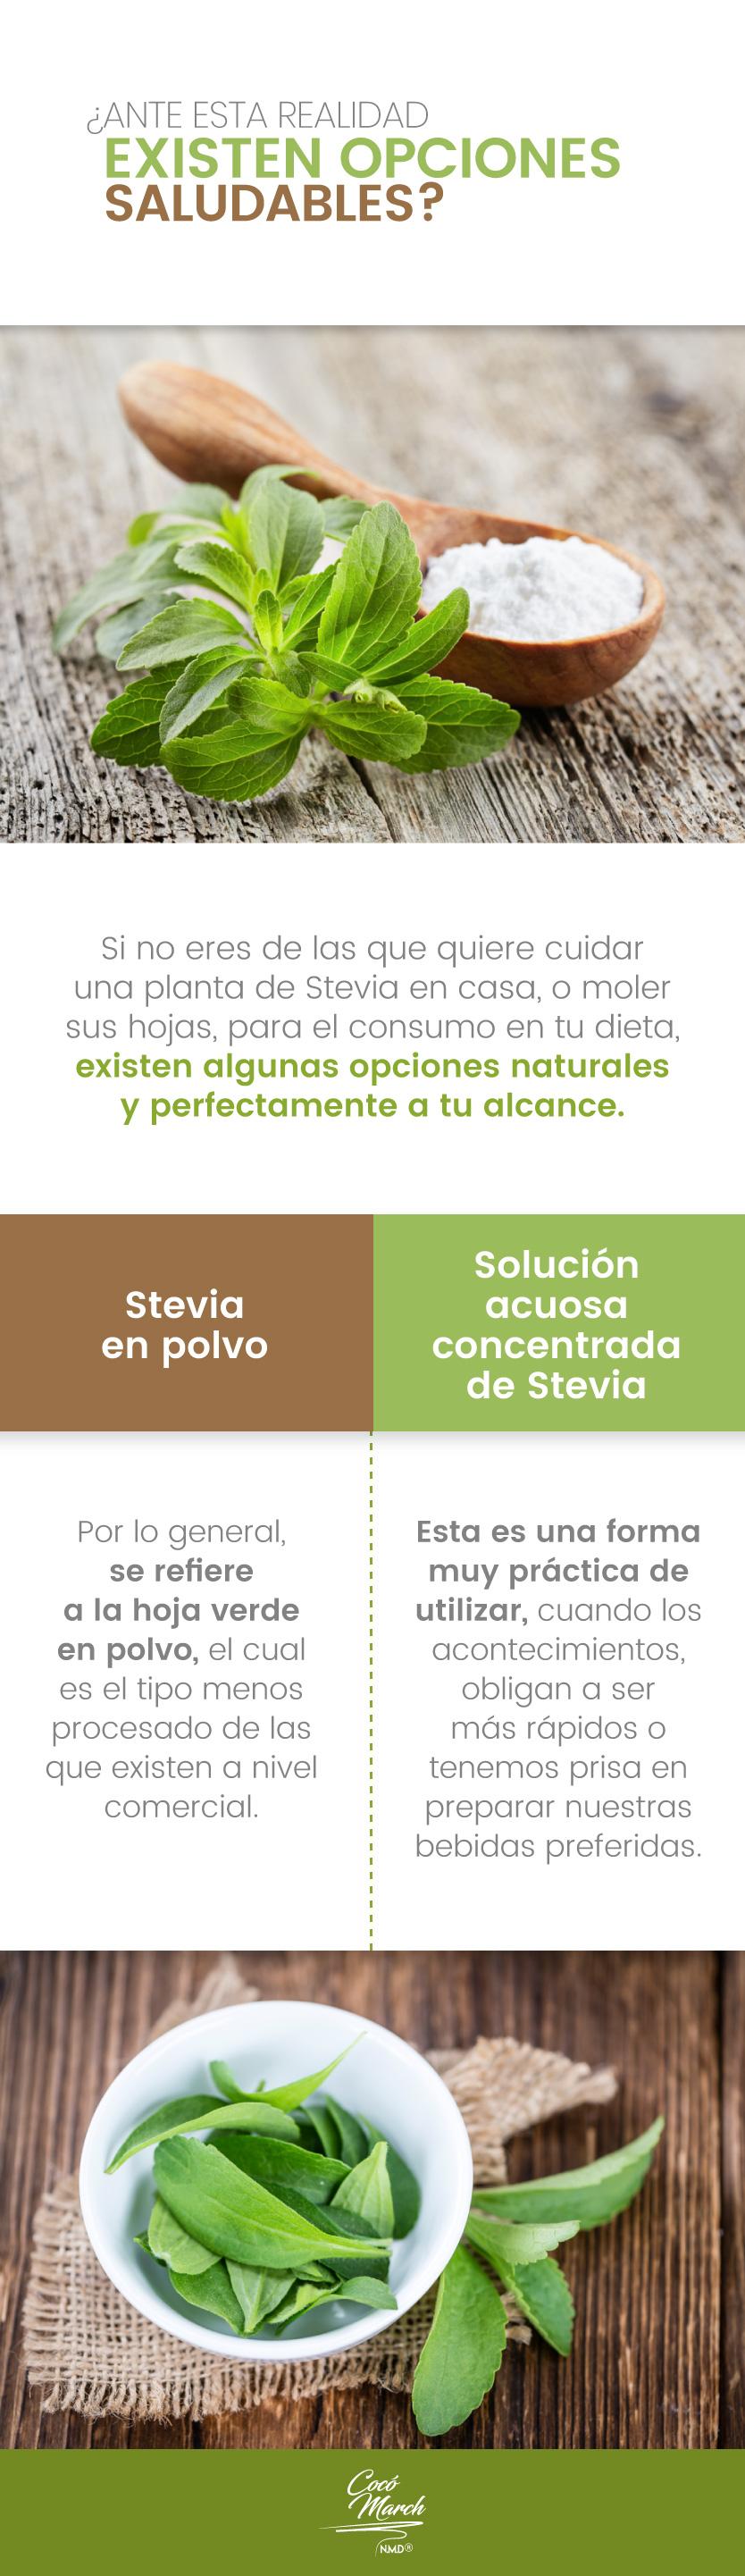 opciones-saludables-stevia